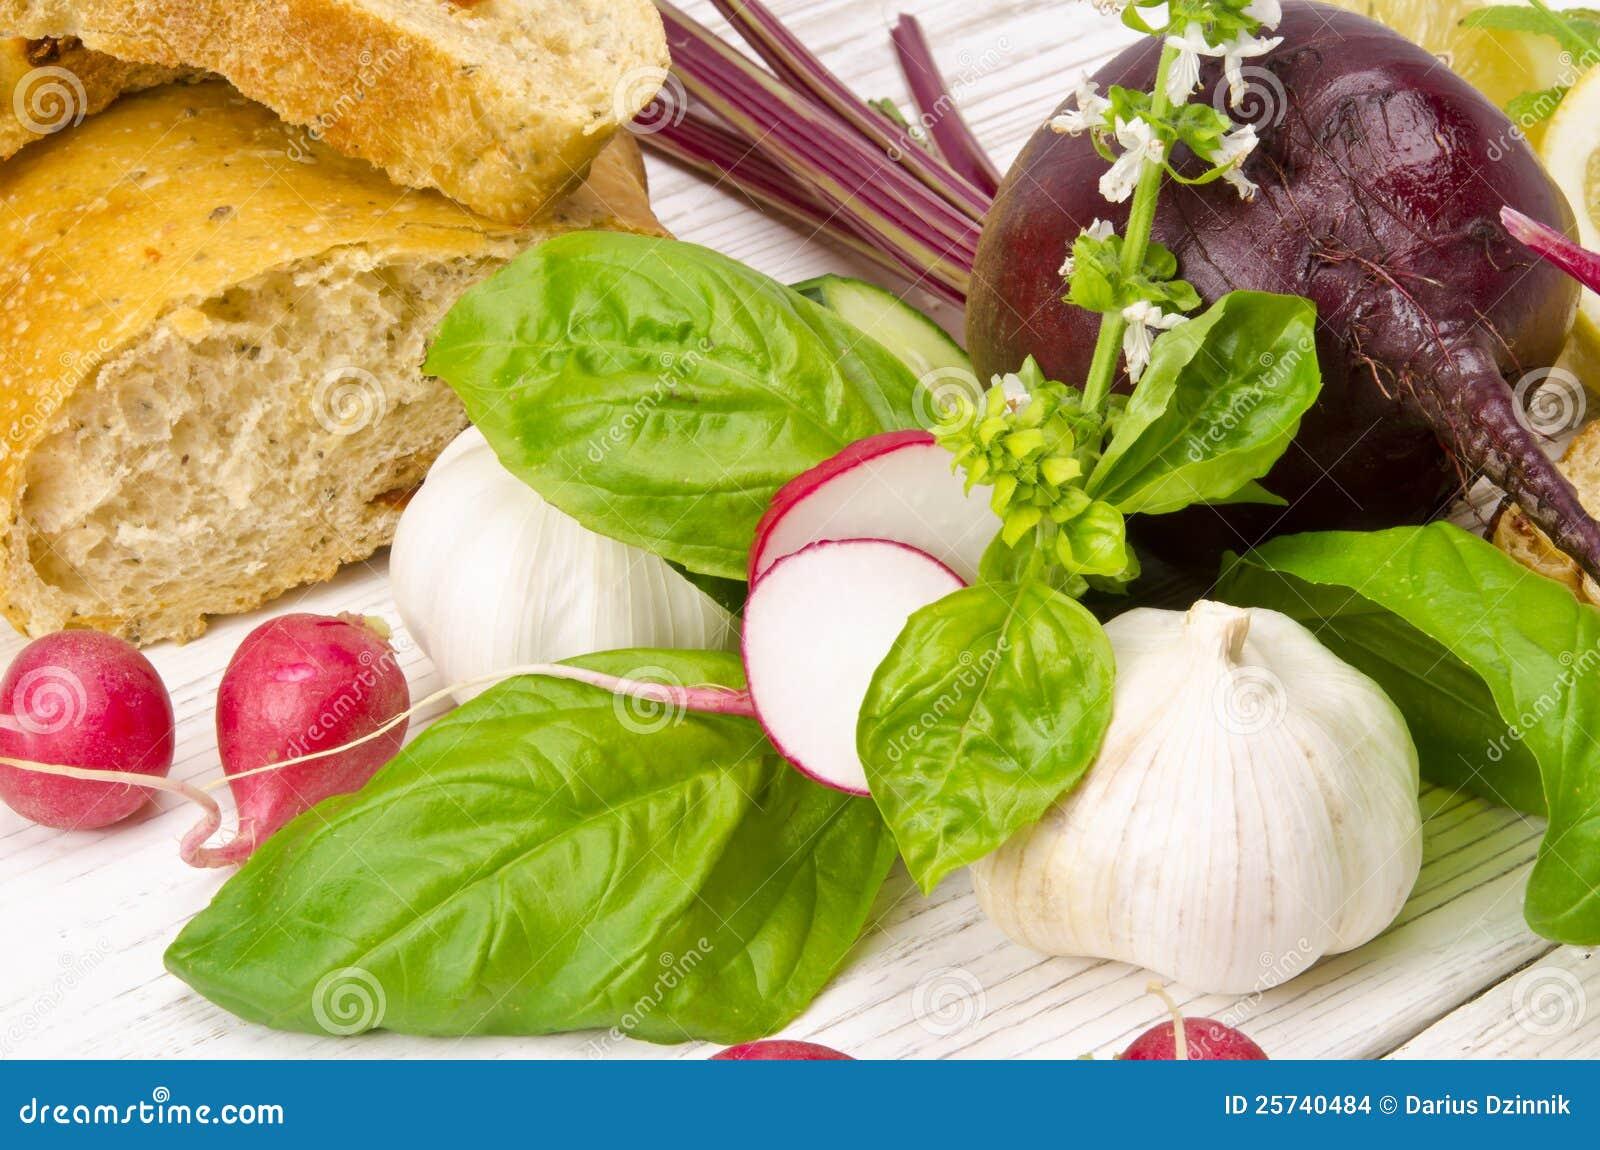 Cold beet soup ingredient